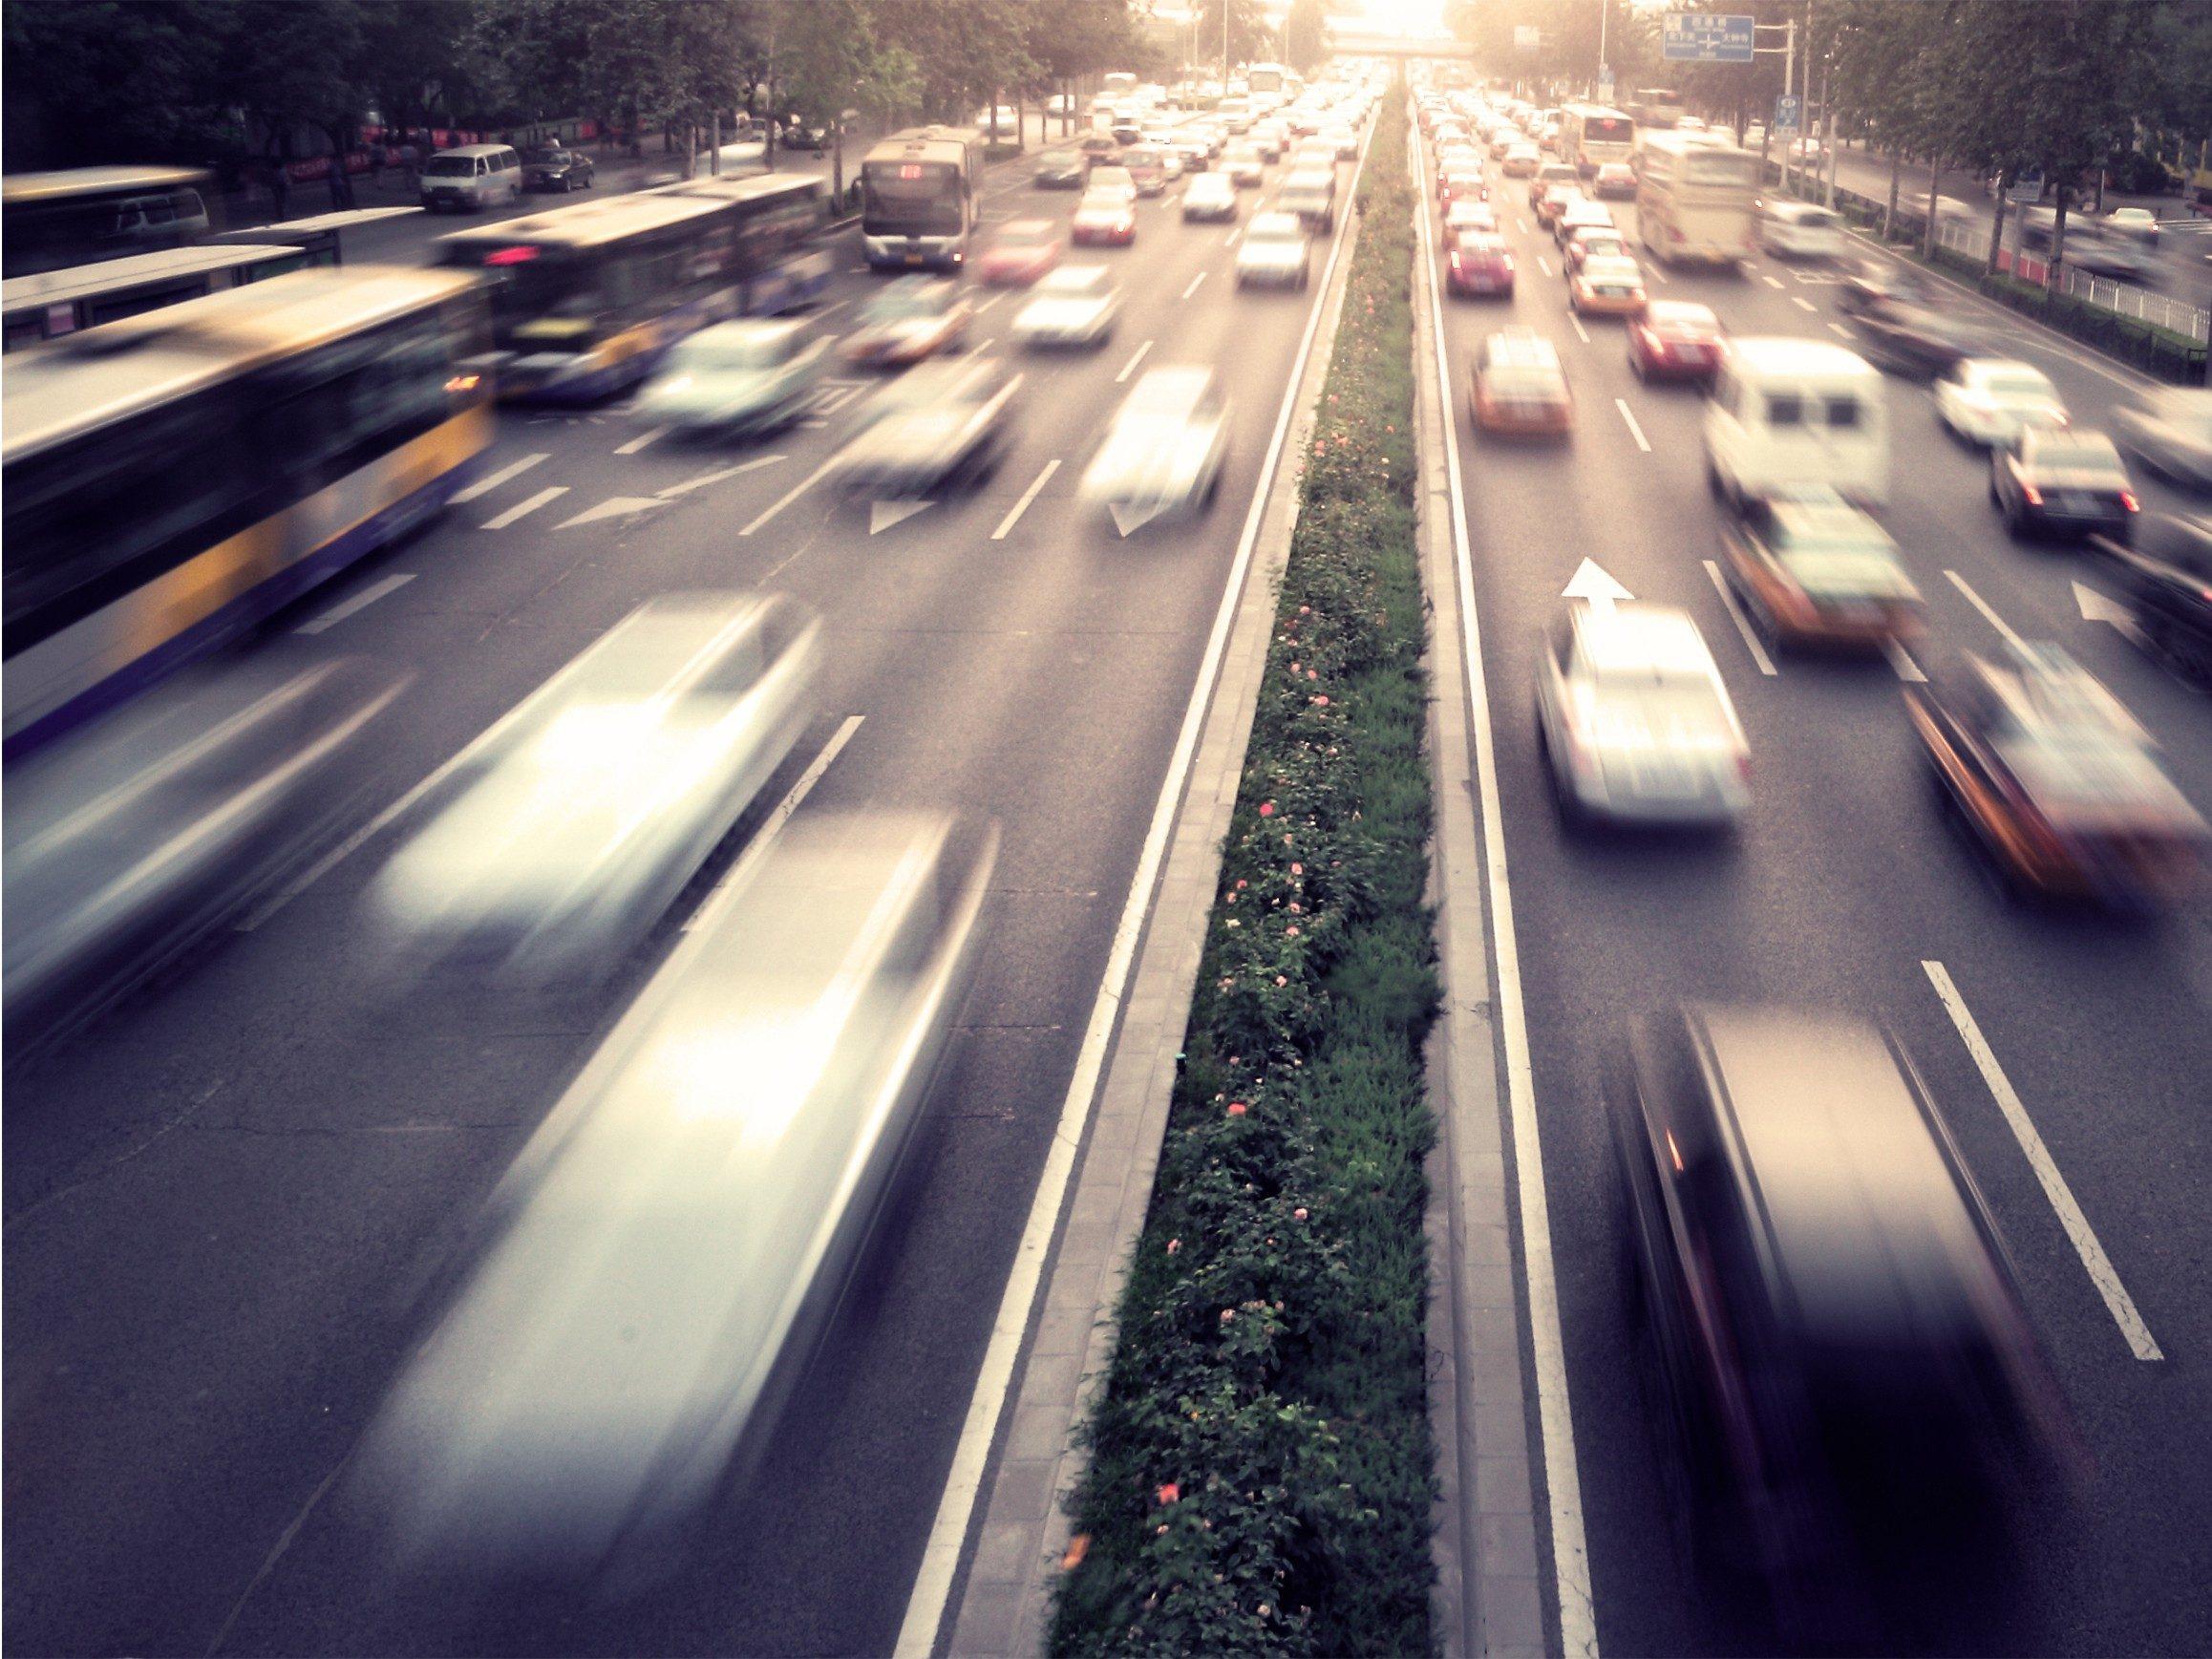 Driving tip #11: Leave room between cars.